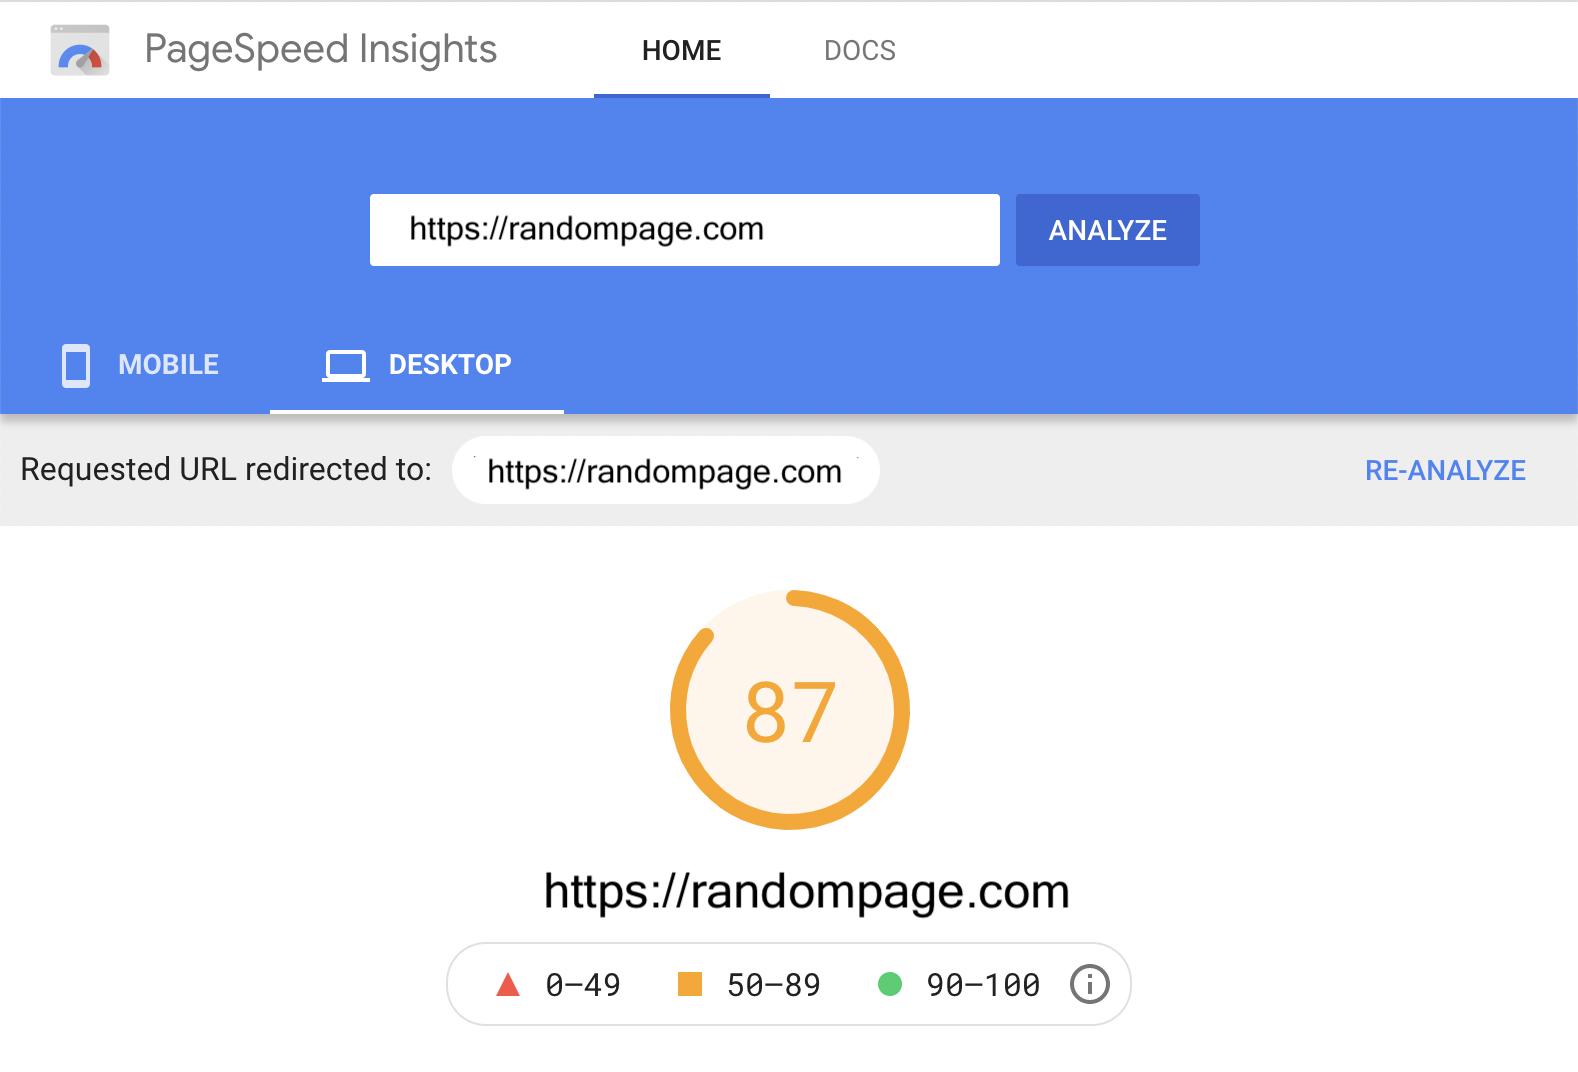 Desktop page speed